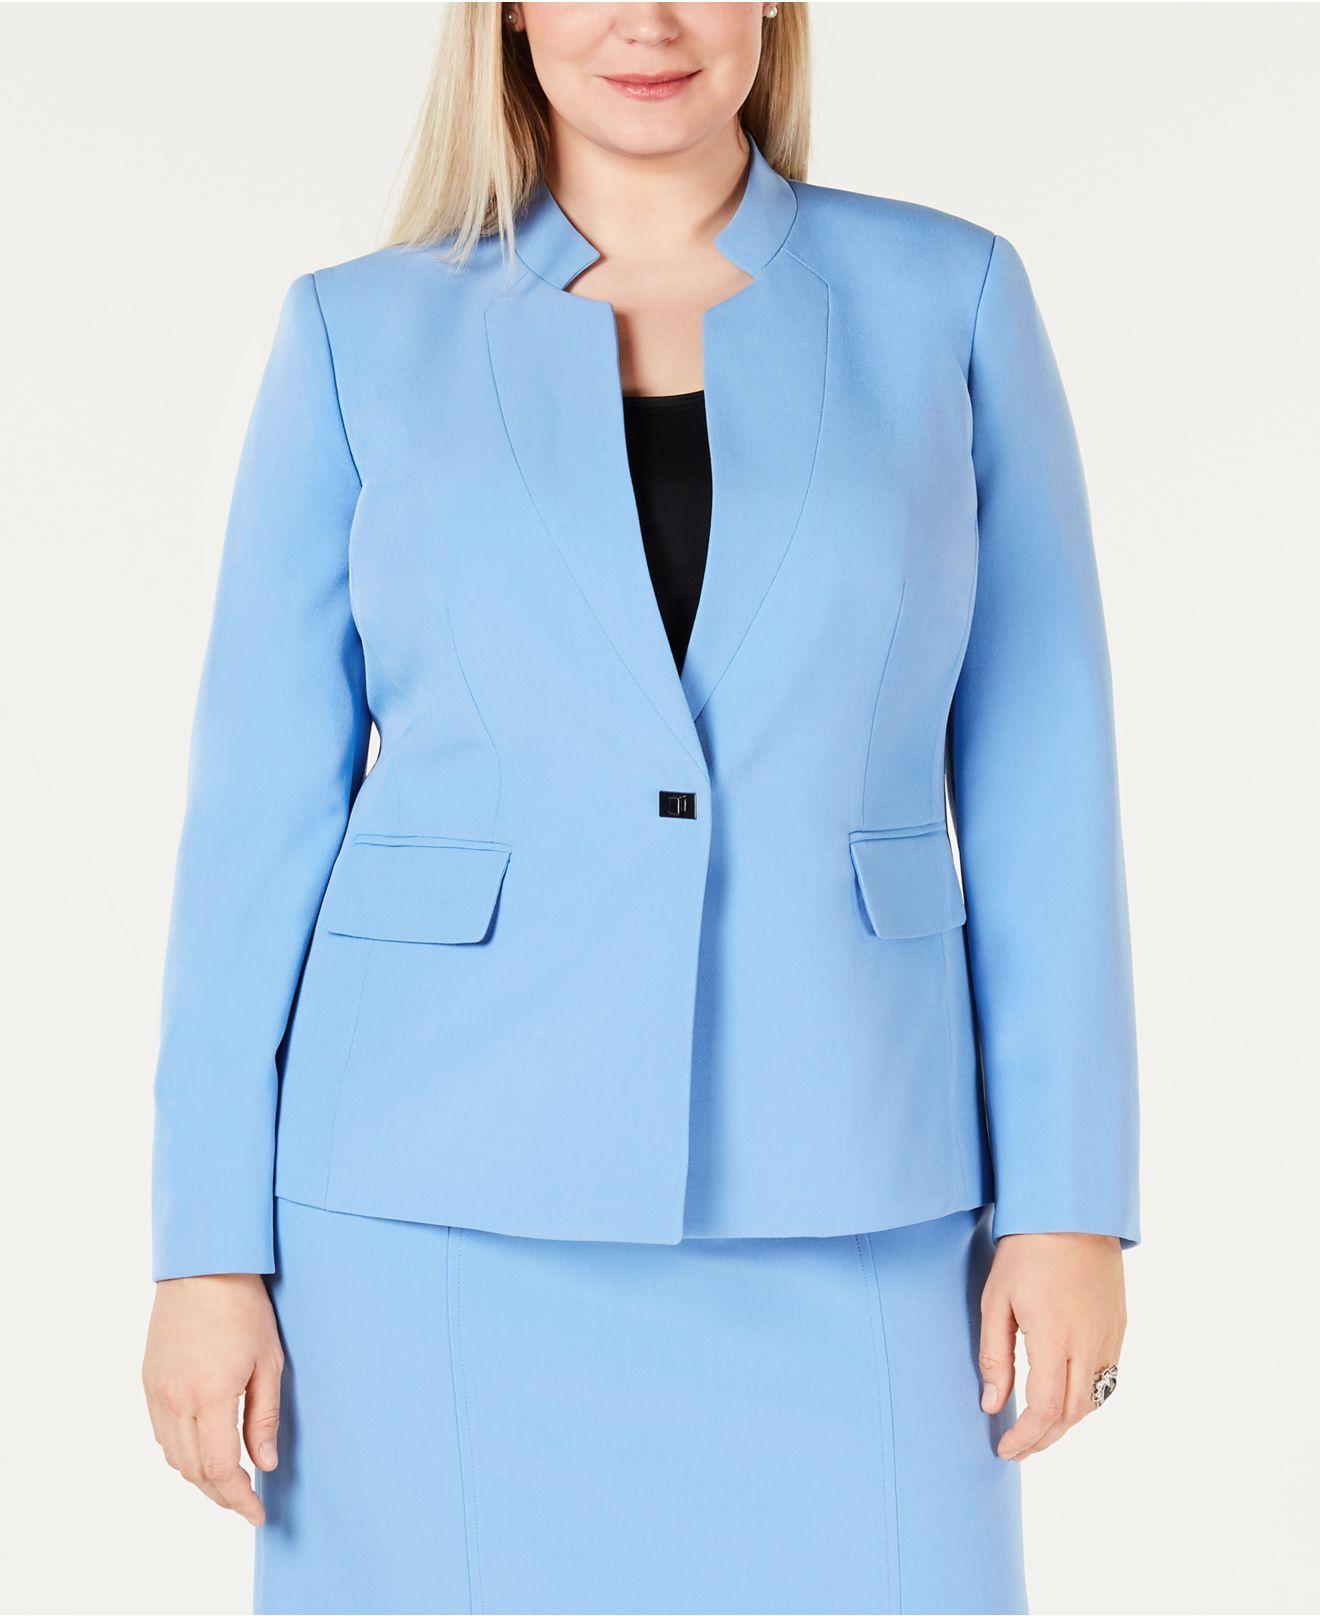 4002129083b Lyst - Kasper Plus Size Inverted-collar Jacket in Blue